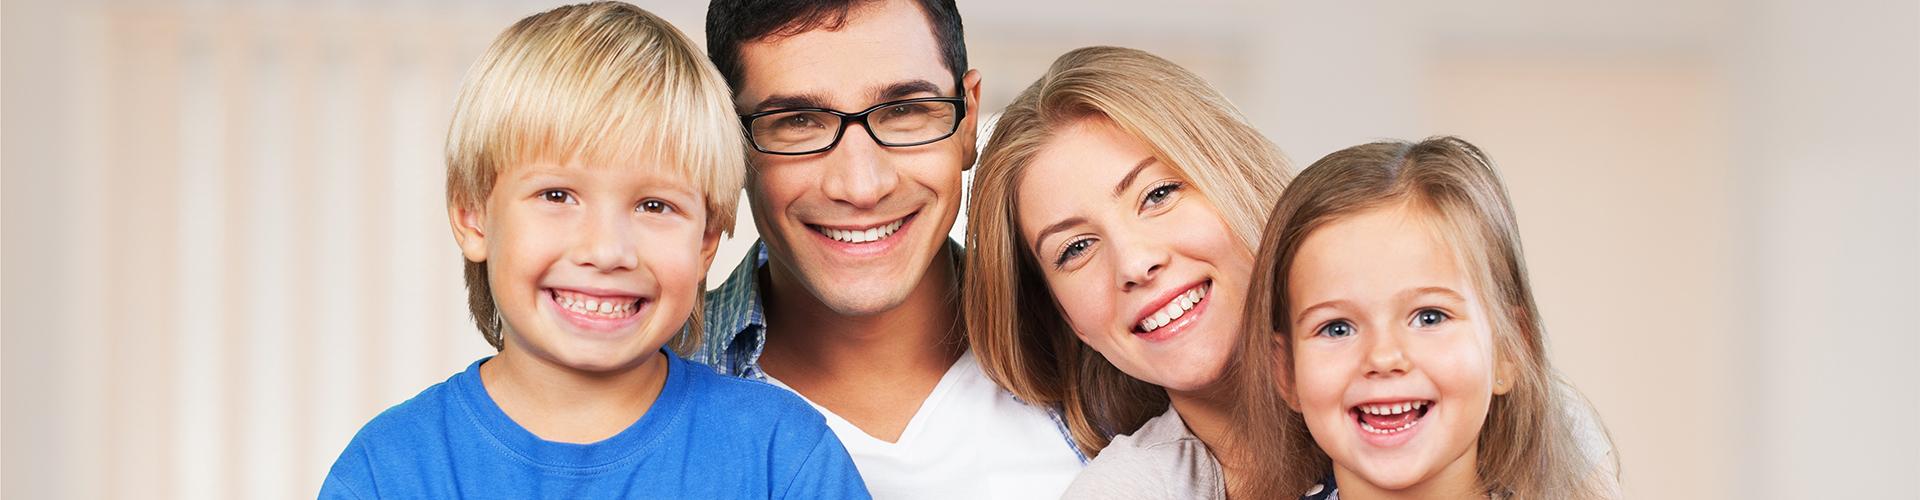 Family care at Vitality Family Chiropractic in Marietta GA